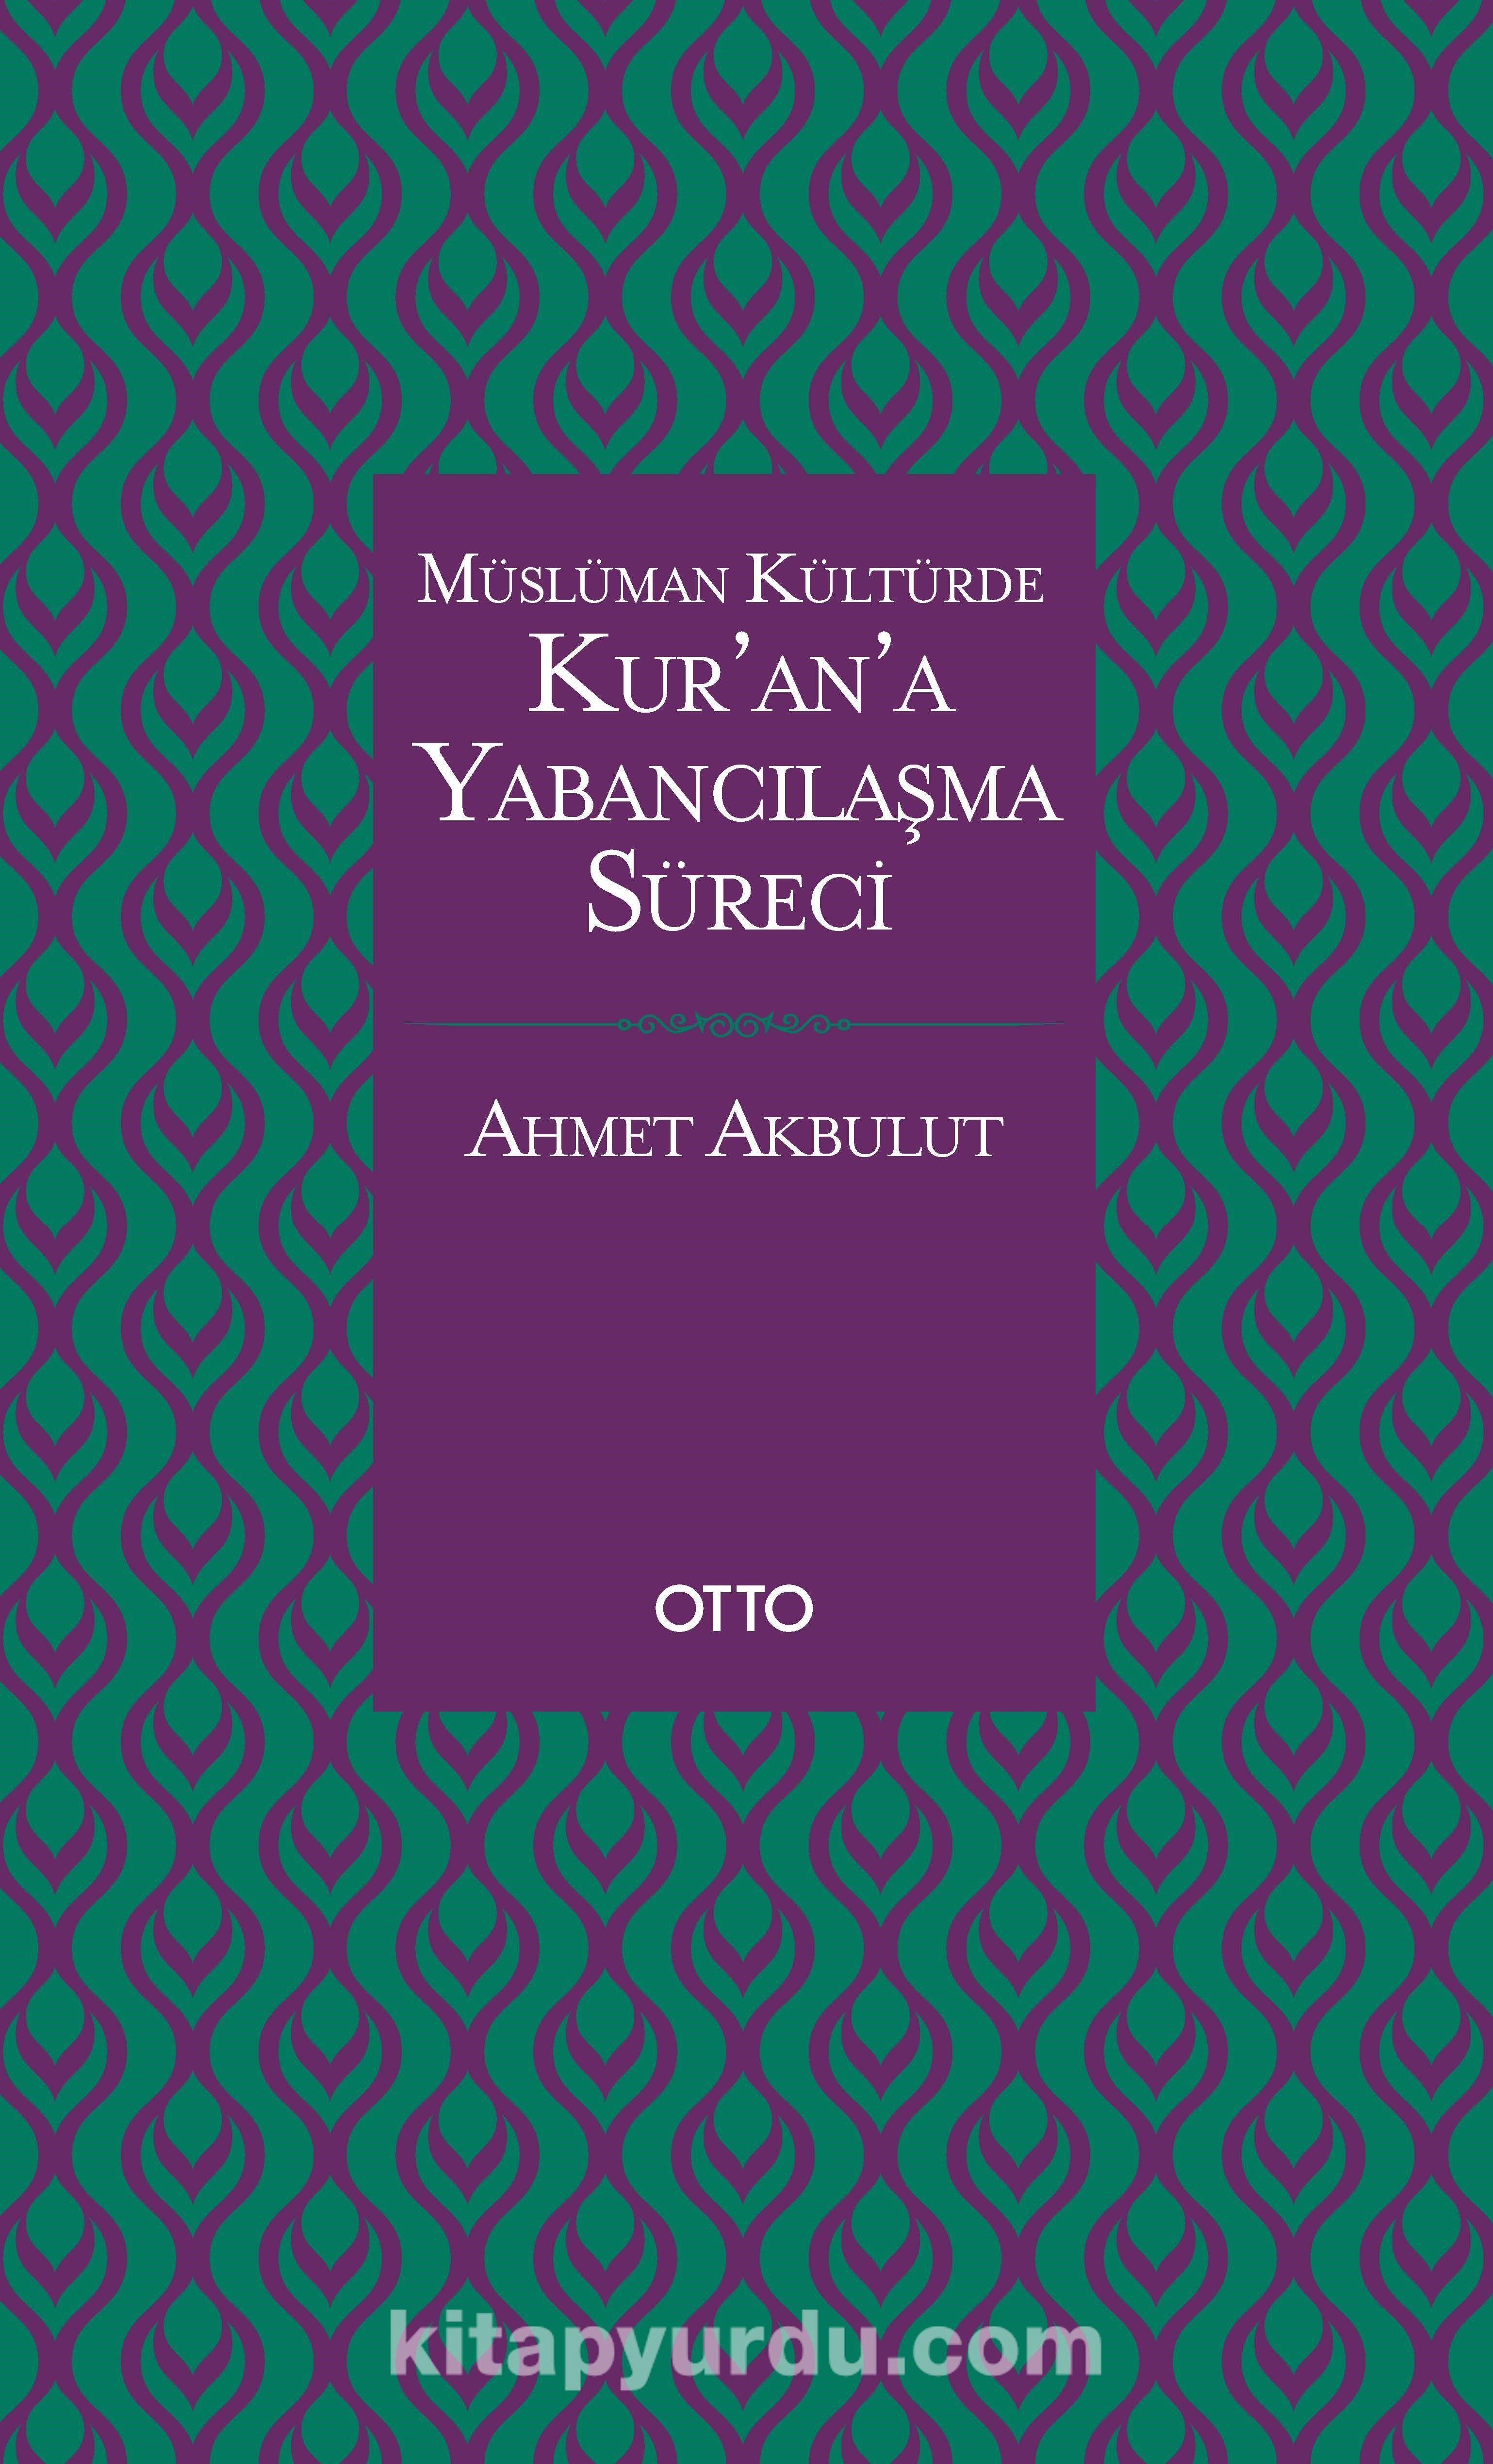 Kur'an'a Yabancılaşma Süreci (Karton Kapak) - Ahmet Akbulut pdf epub